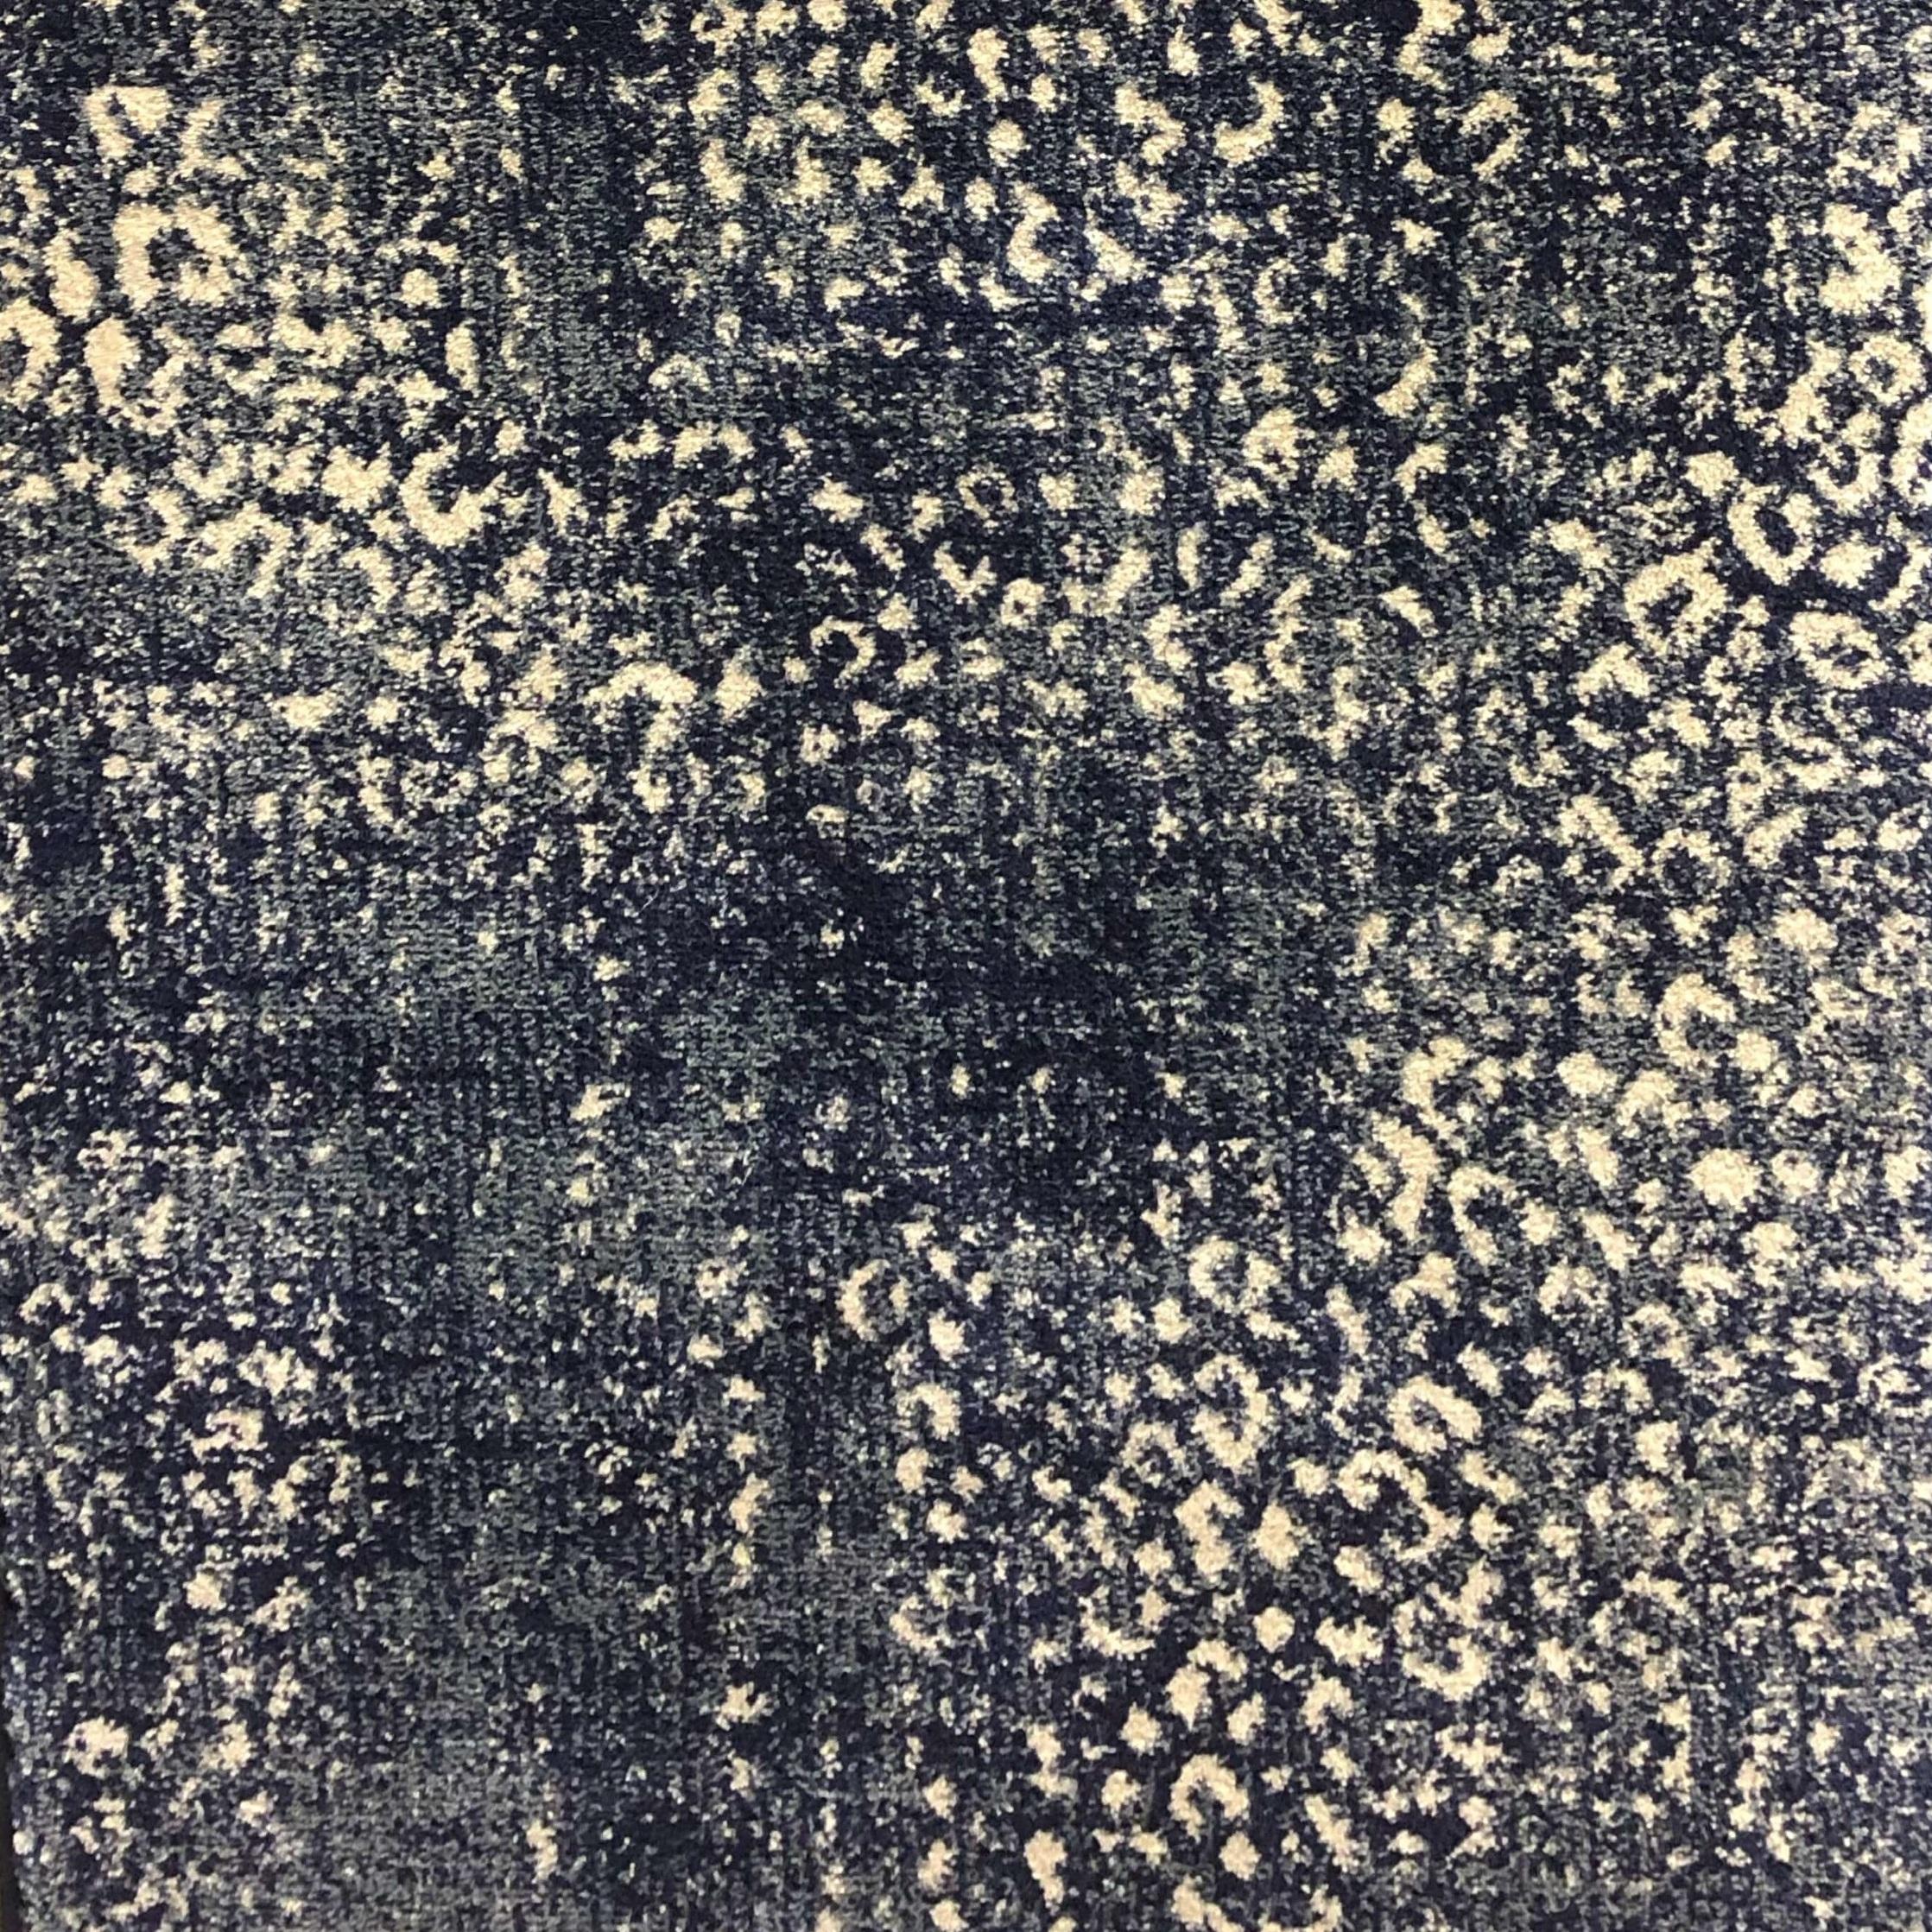 Love the navy blue version of this cheetah patterned carpet. Everyone loves an animal print! #rugideas #animalprintcarpet